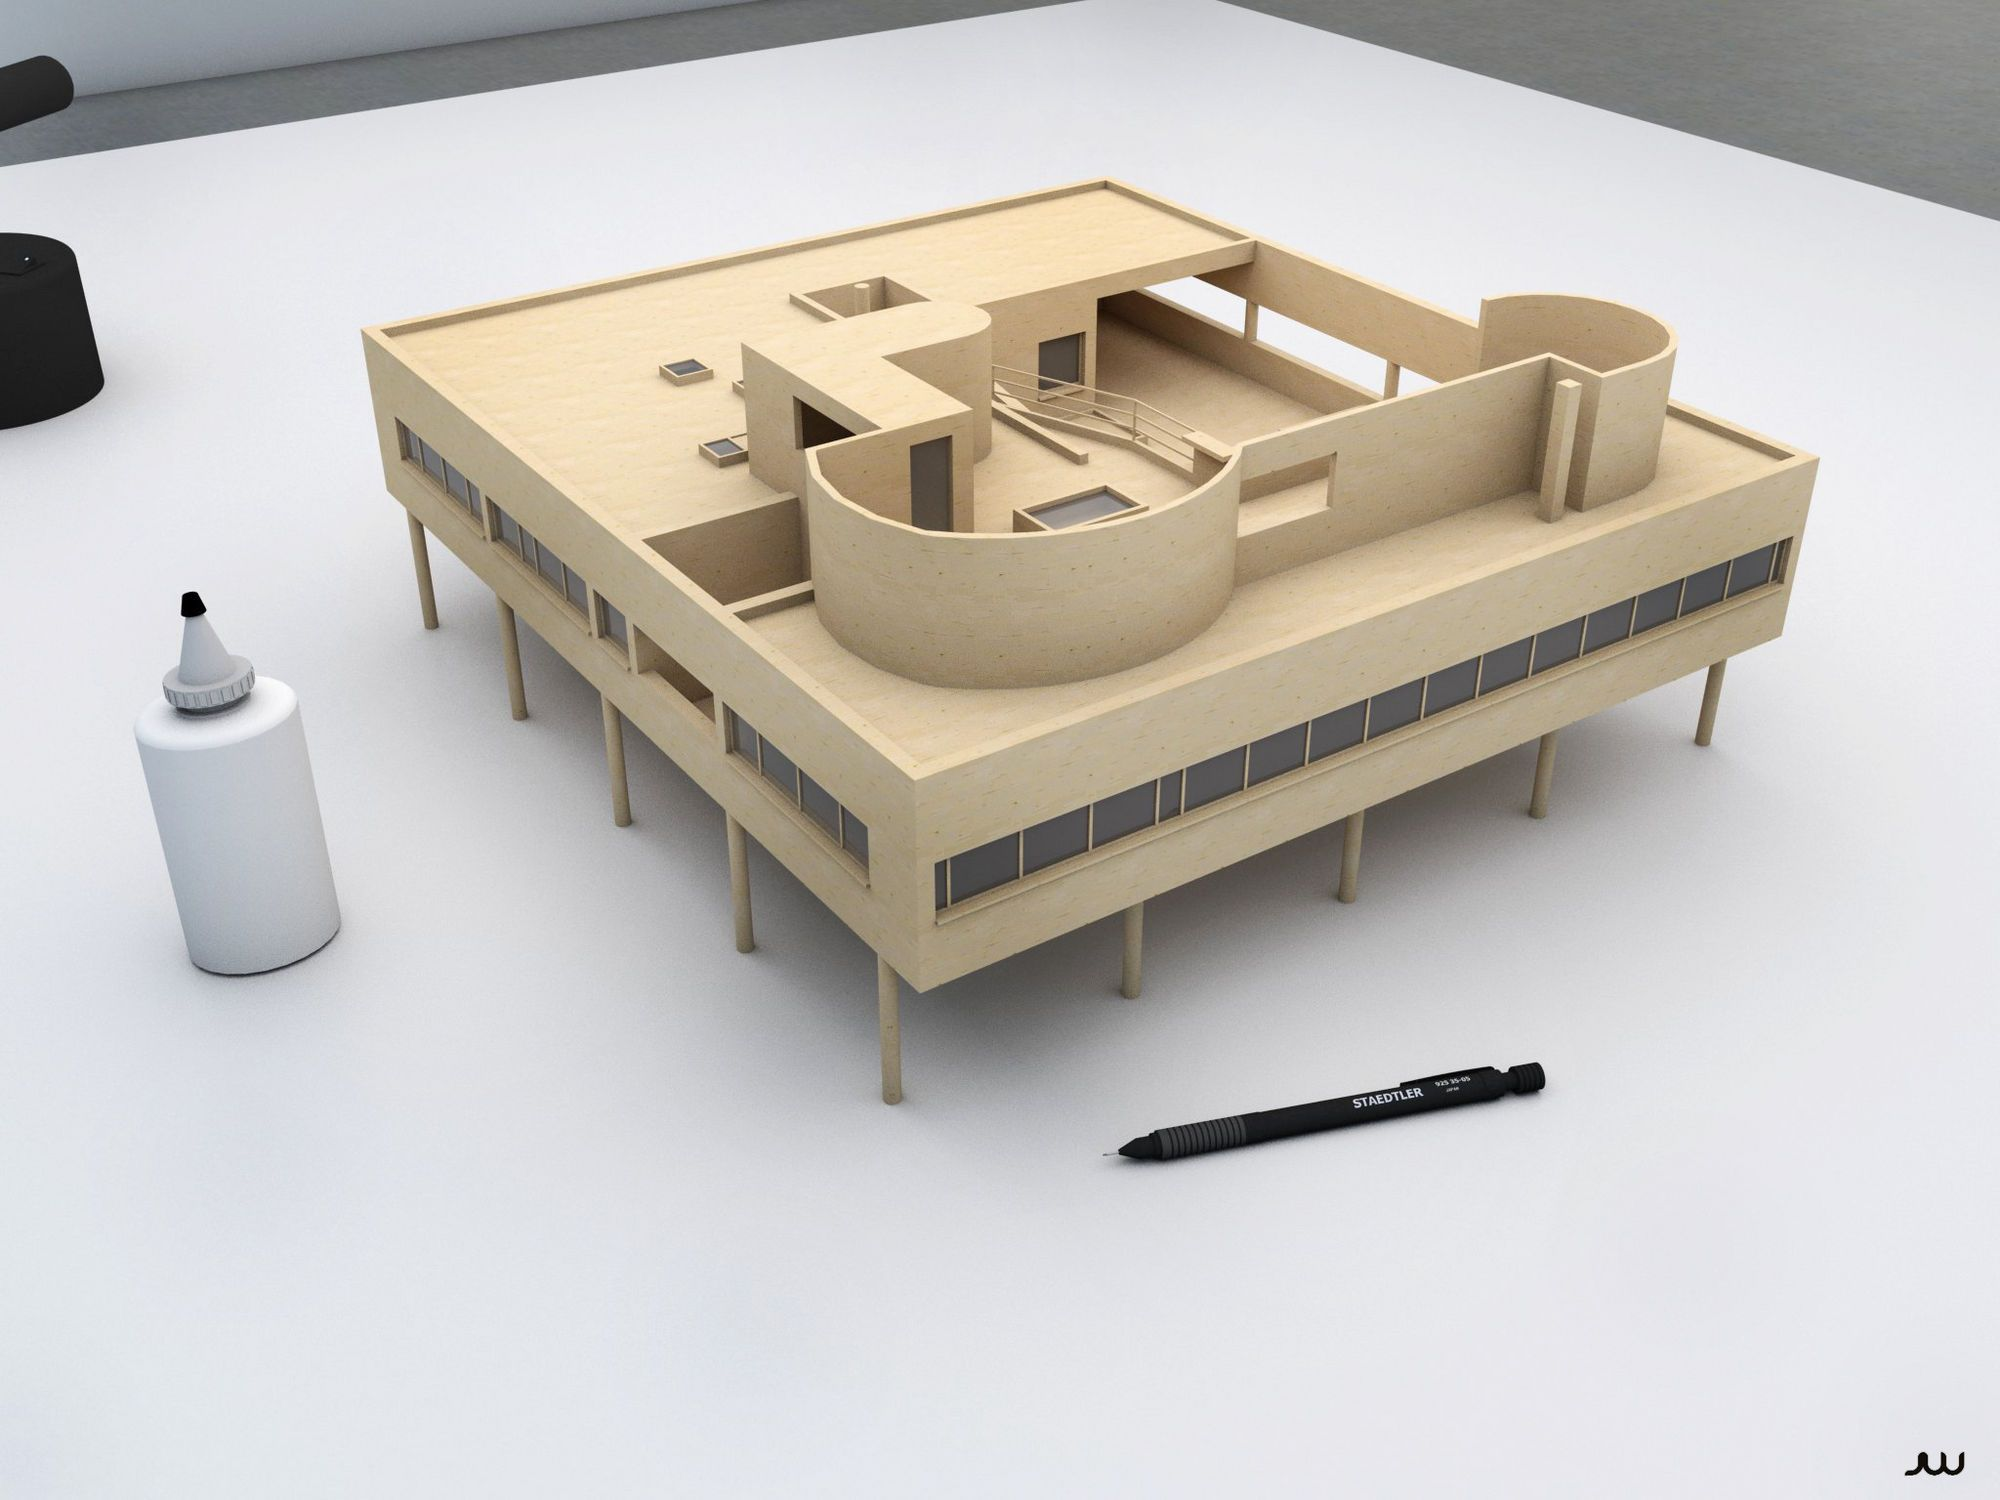 Bien-aimé villa savoye - Google 搜尋 | Villas | Pinterest | Architecture BA75